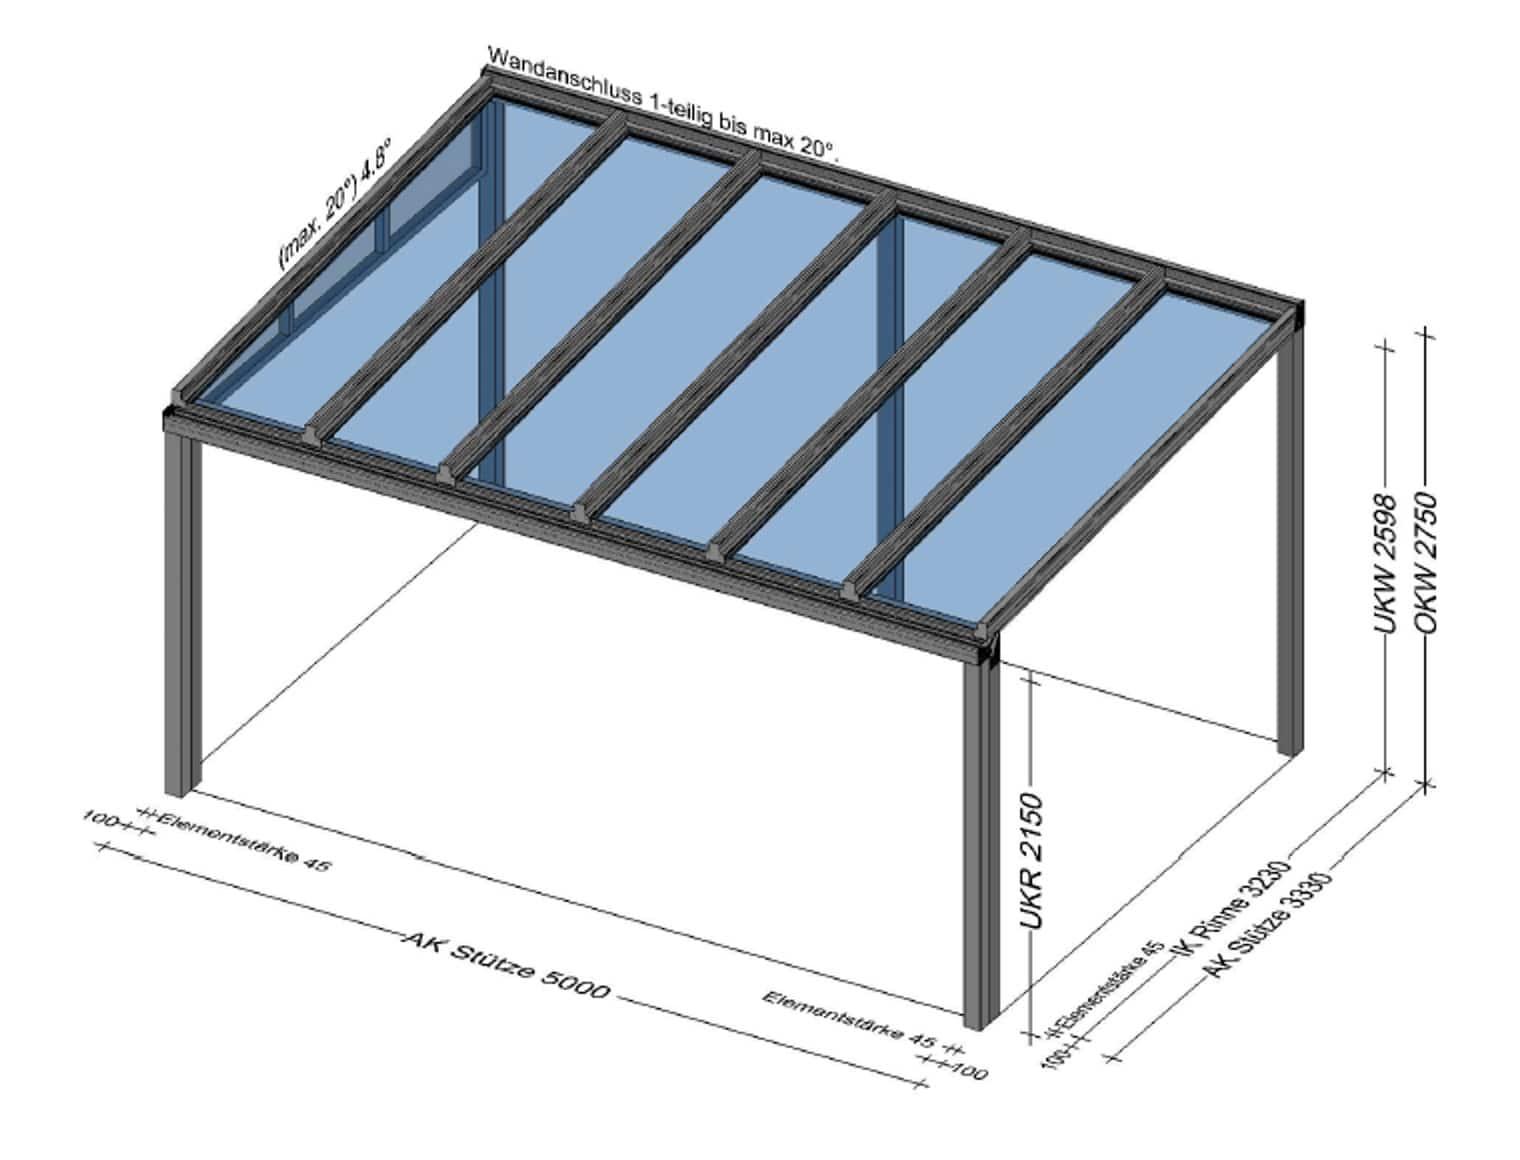 Terrassenüberdachung Alu 5 x 3 Meter